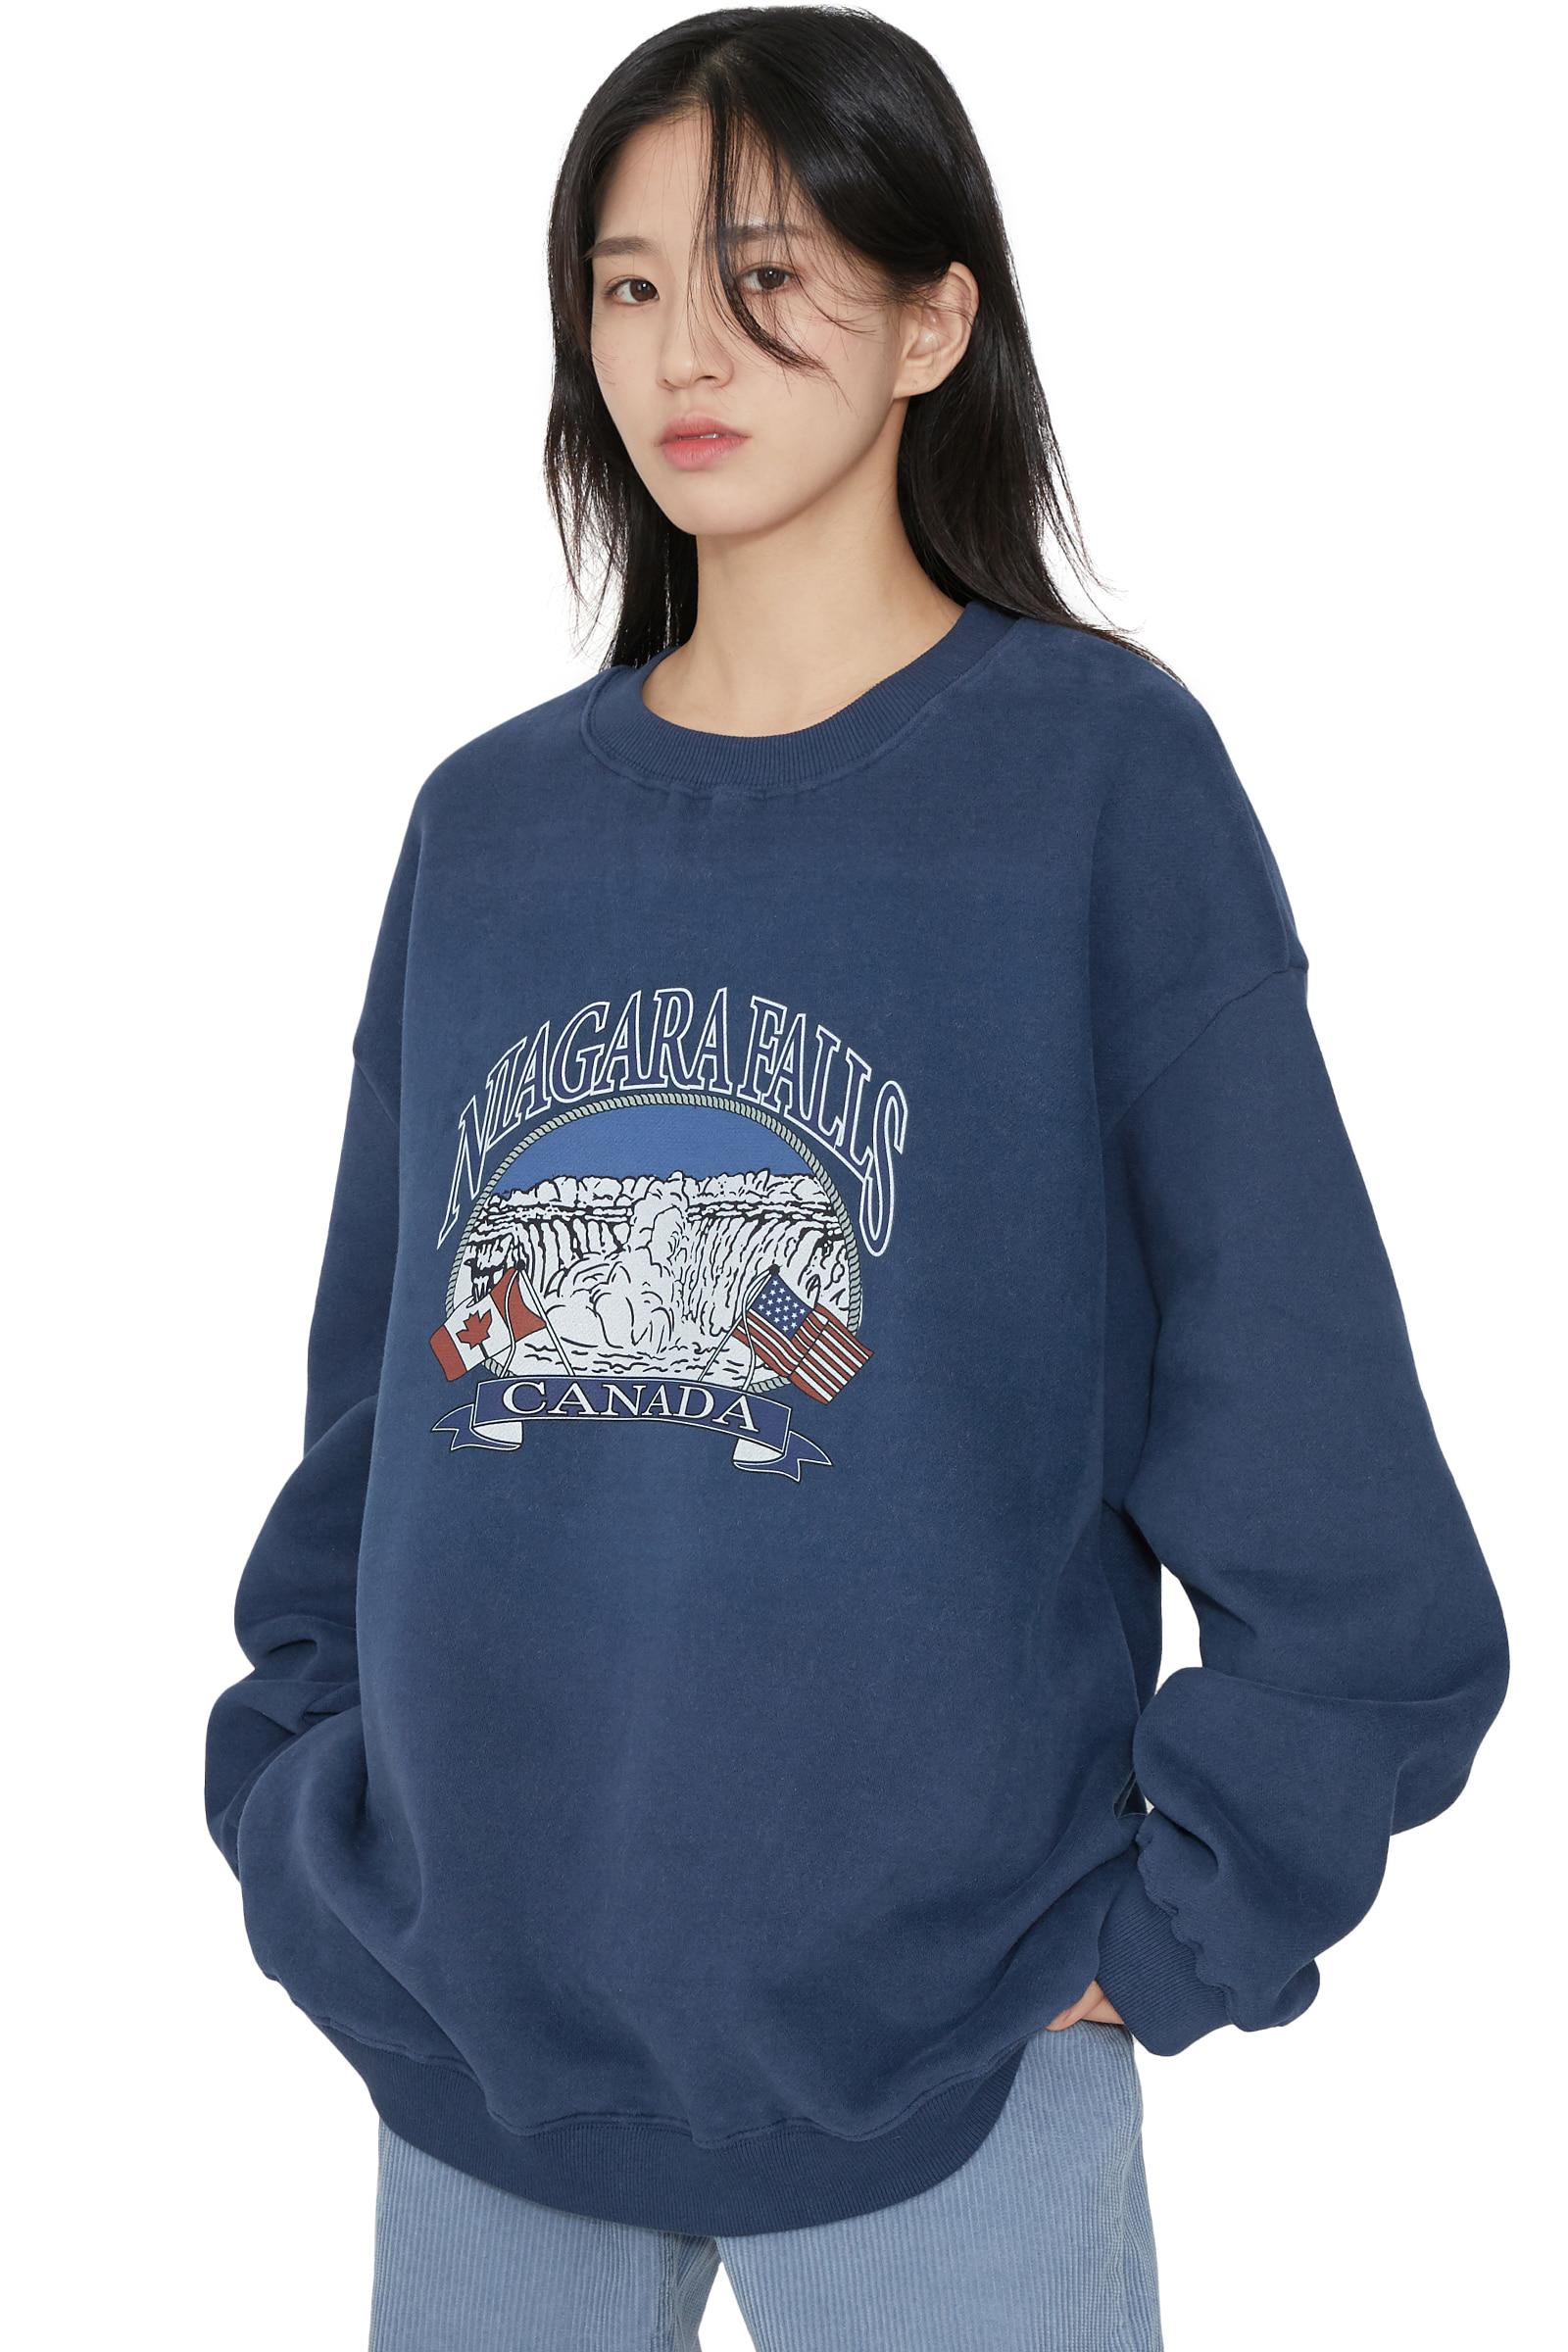 Niagara Fleece-lined crew neck sweatshirt